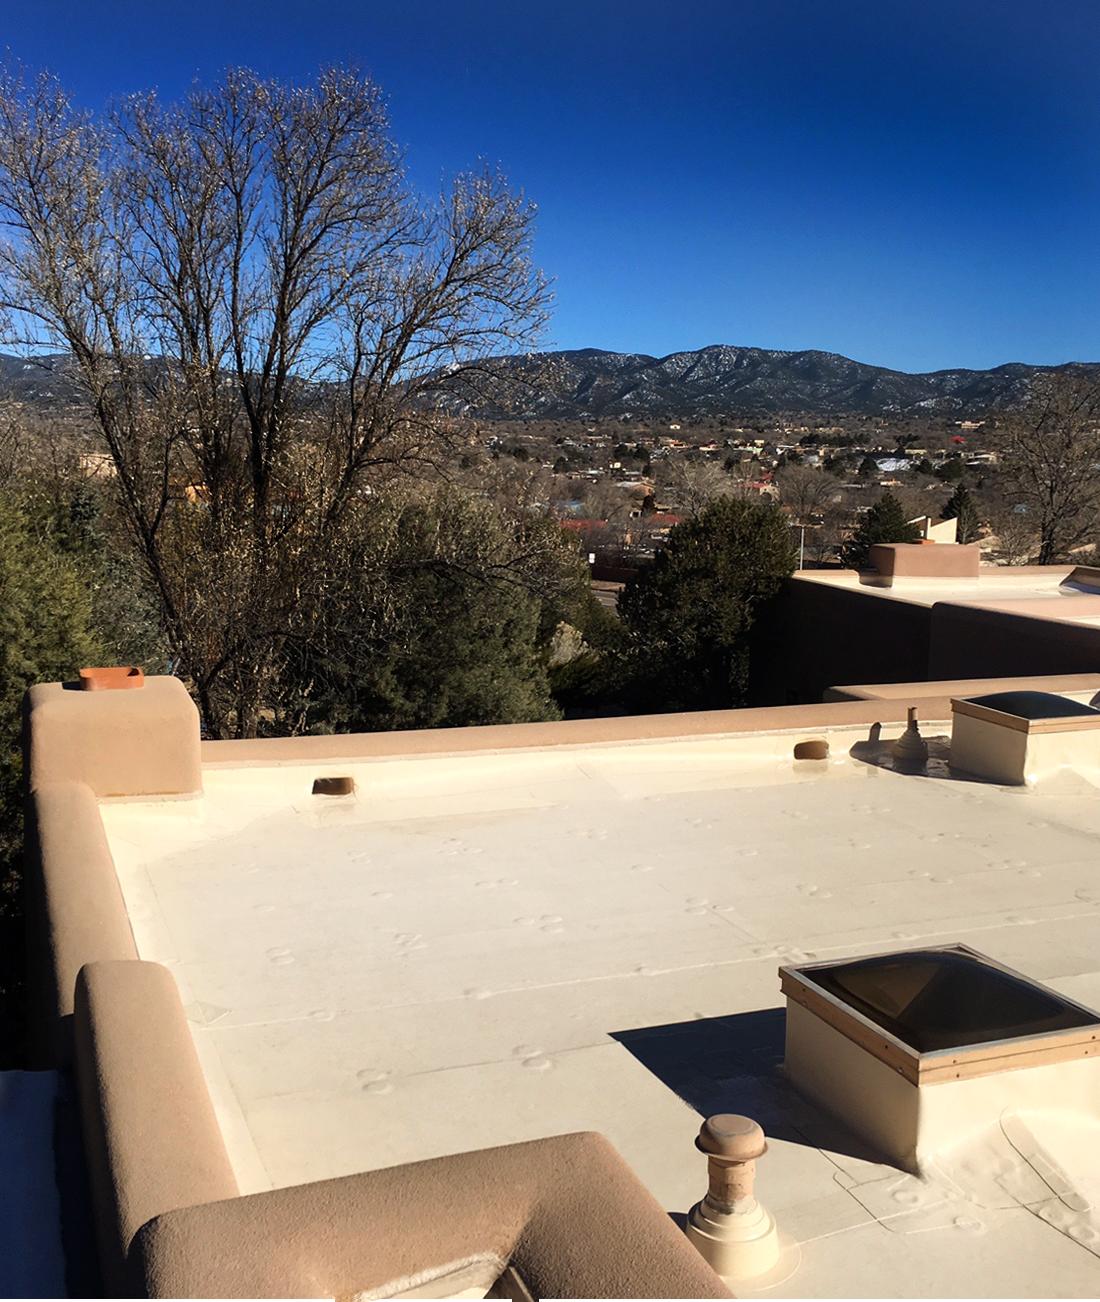 Roofing Company in Santa Fe